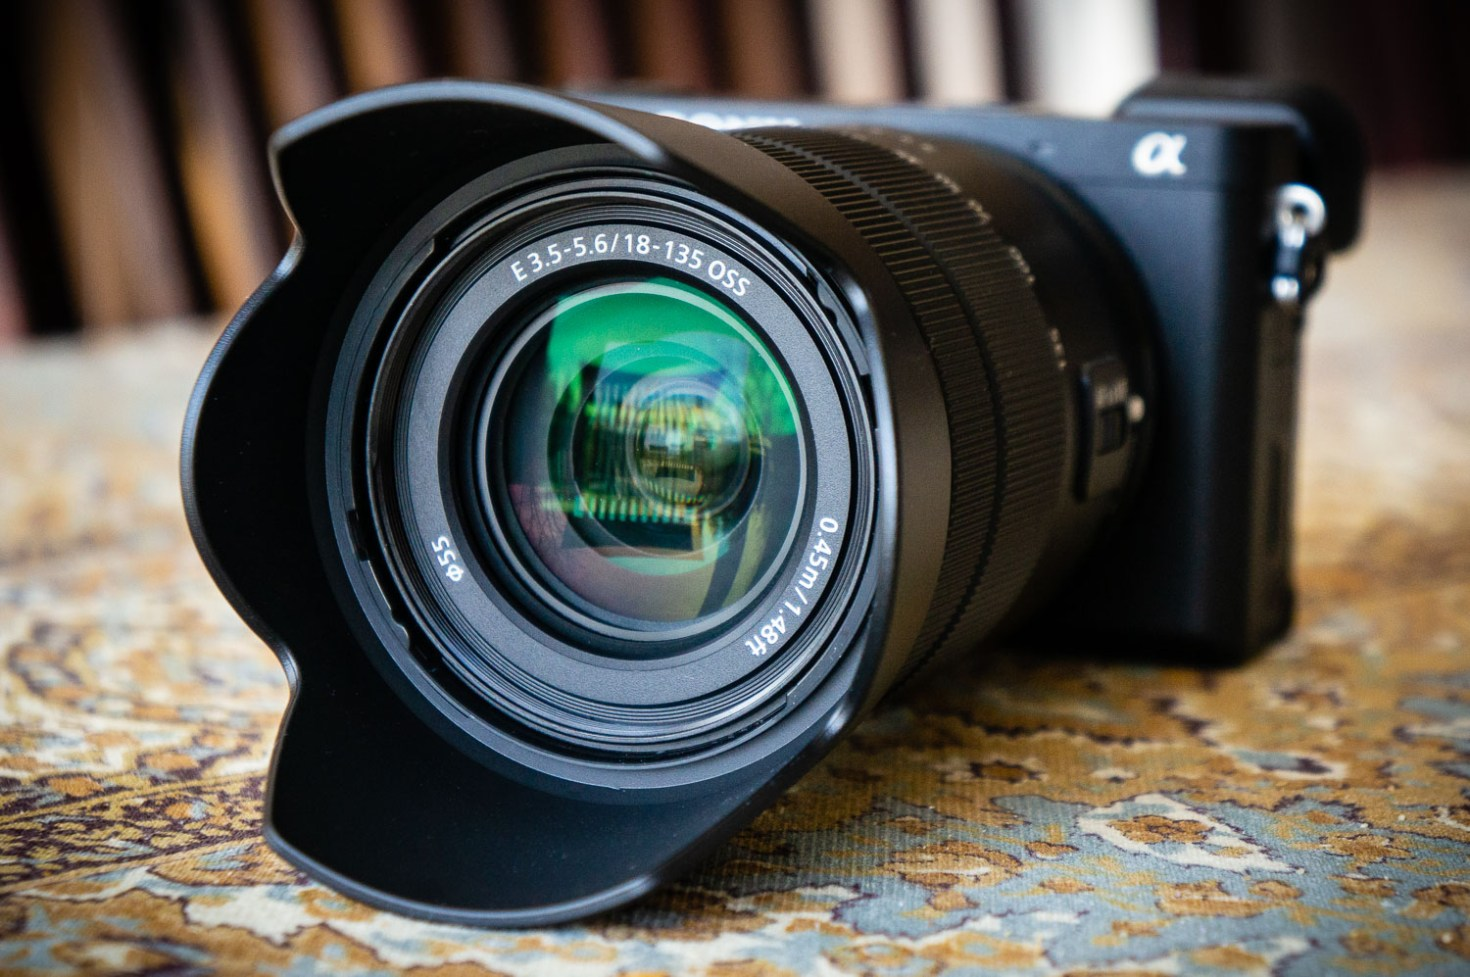 Sony A6400 w/ 18-135mm F/3.5-5.6 OSS Lens